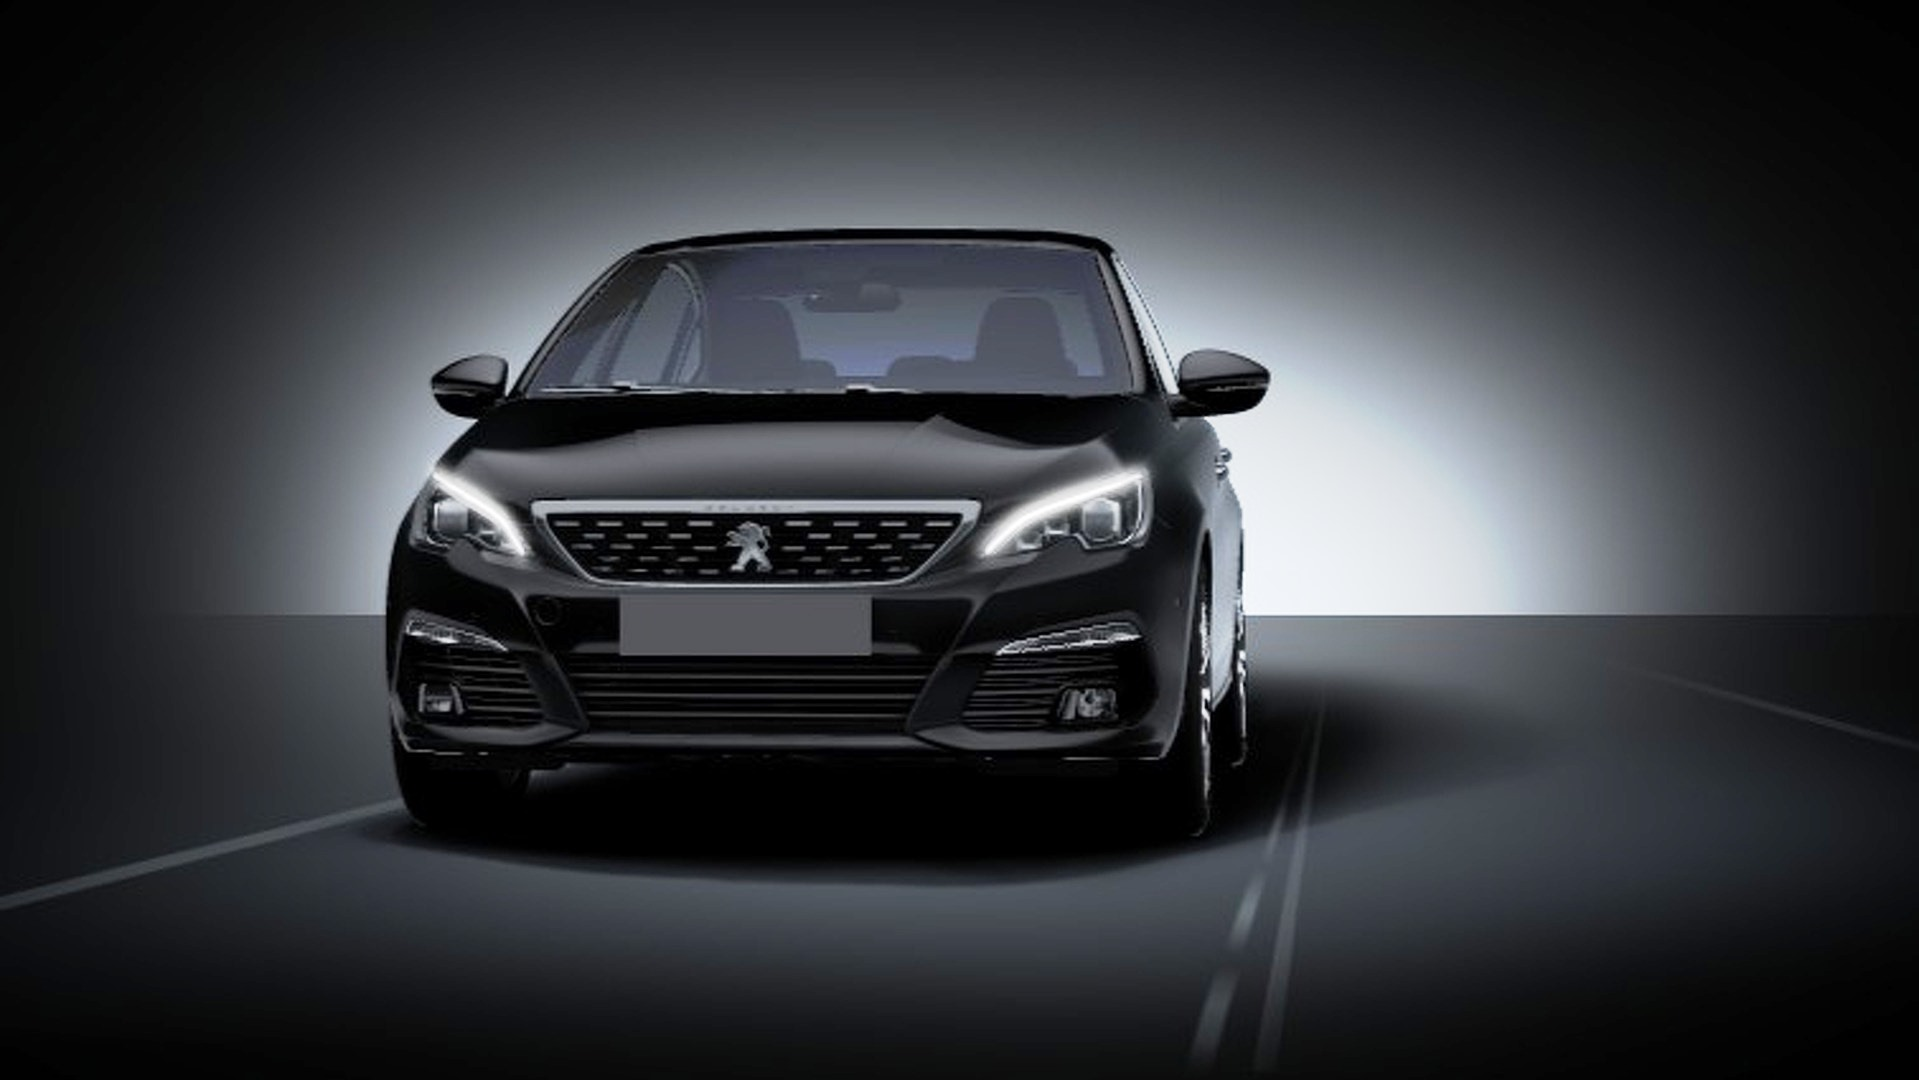 Peugeot 308 Facelift 2018 leaked (1)